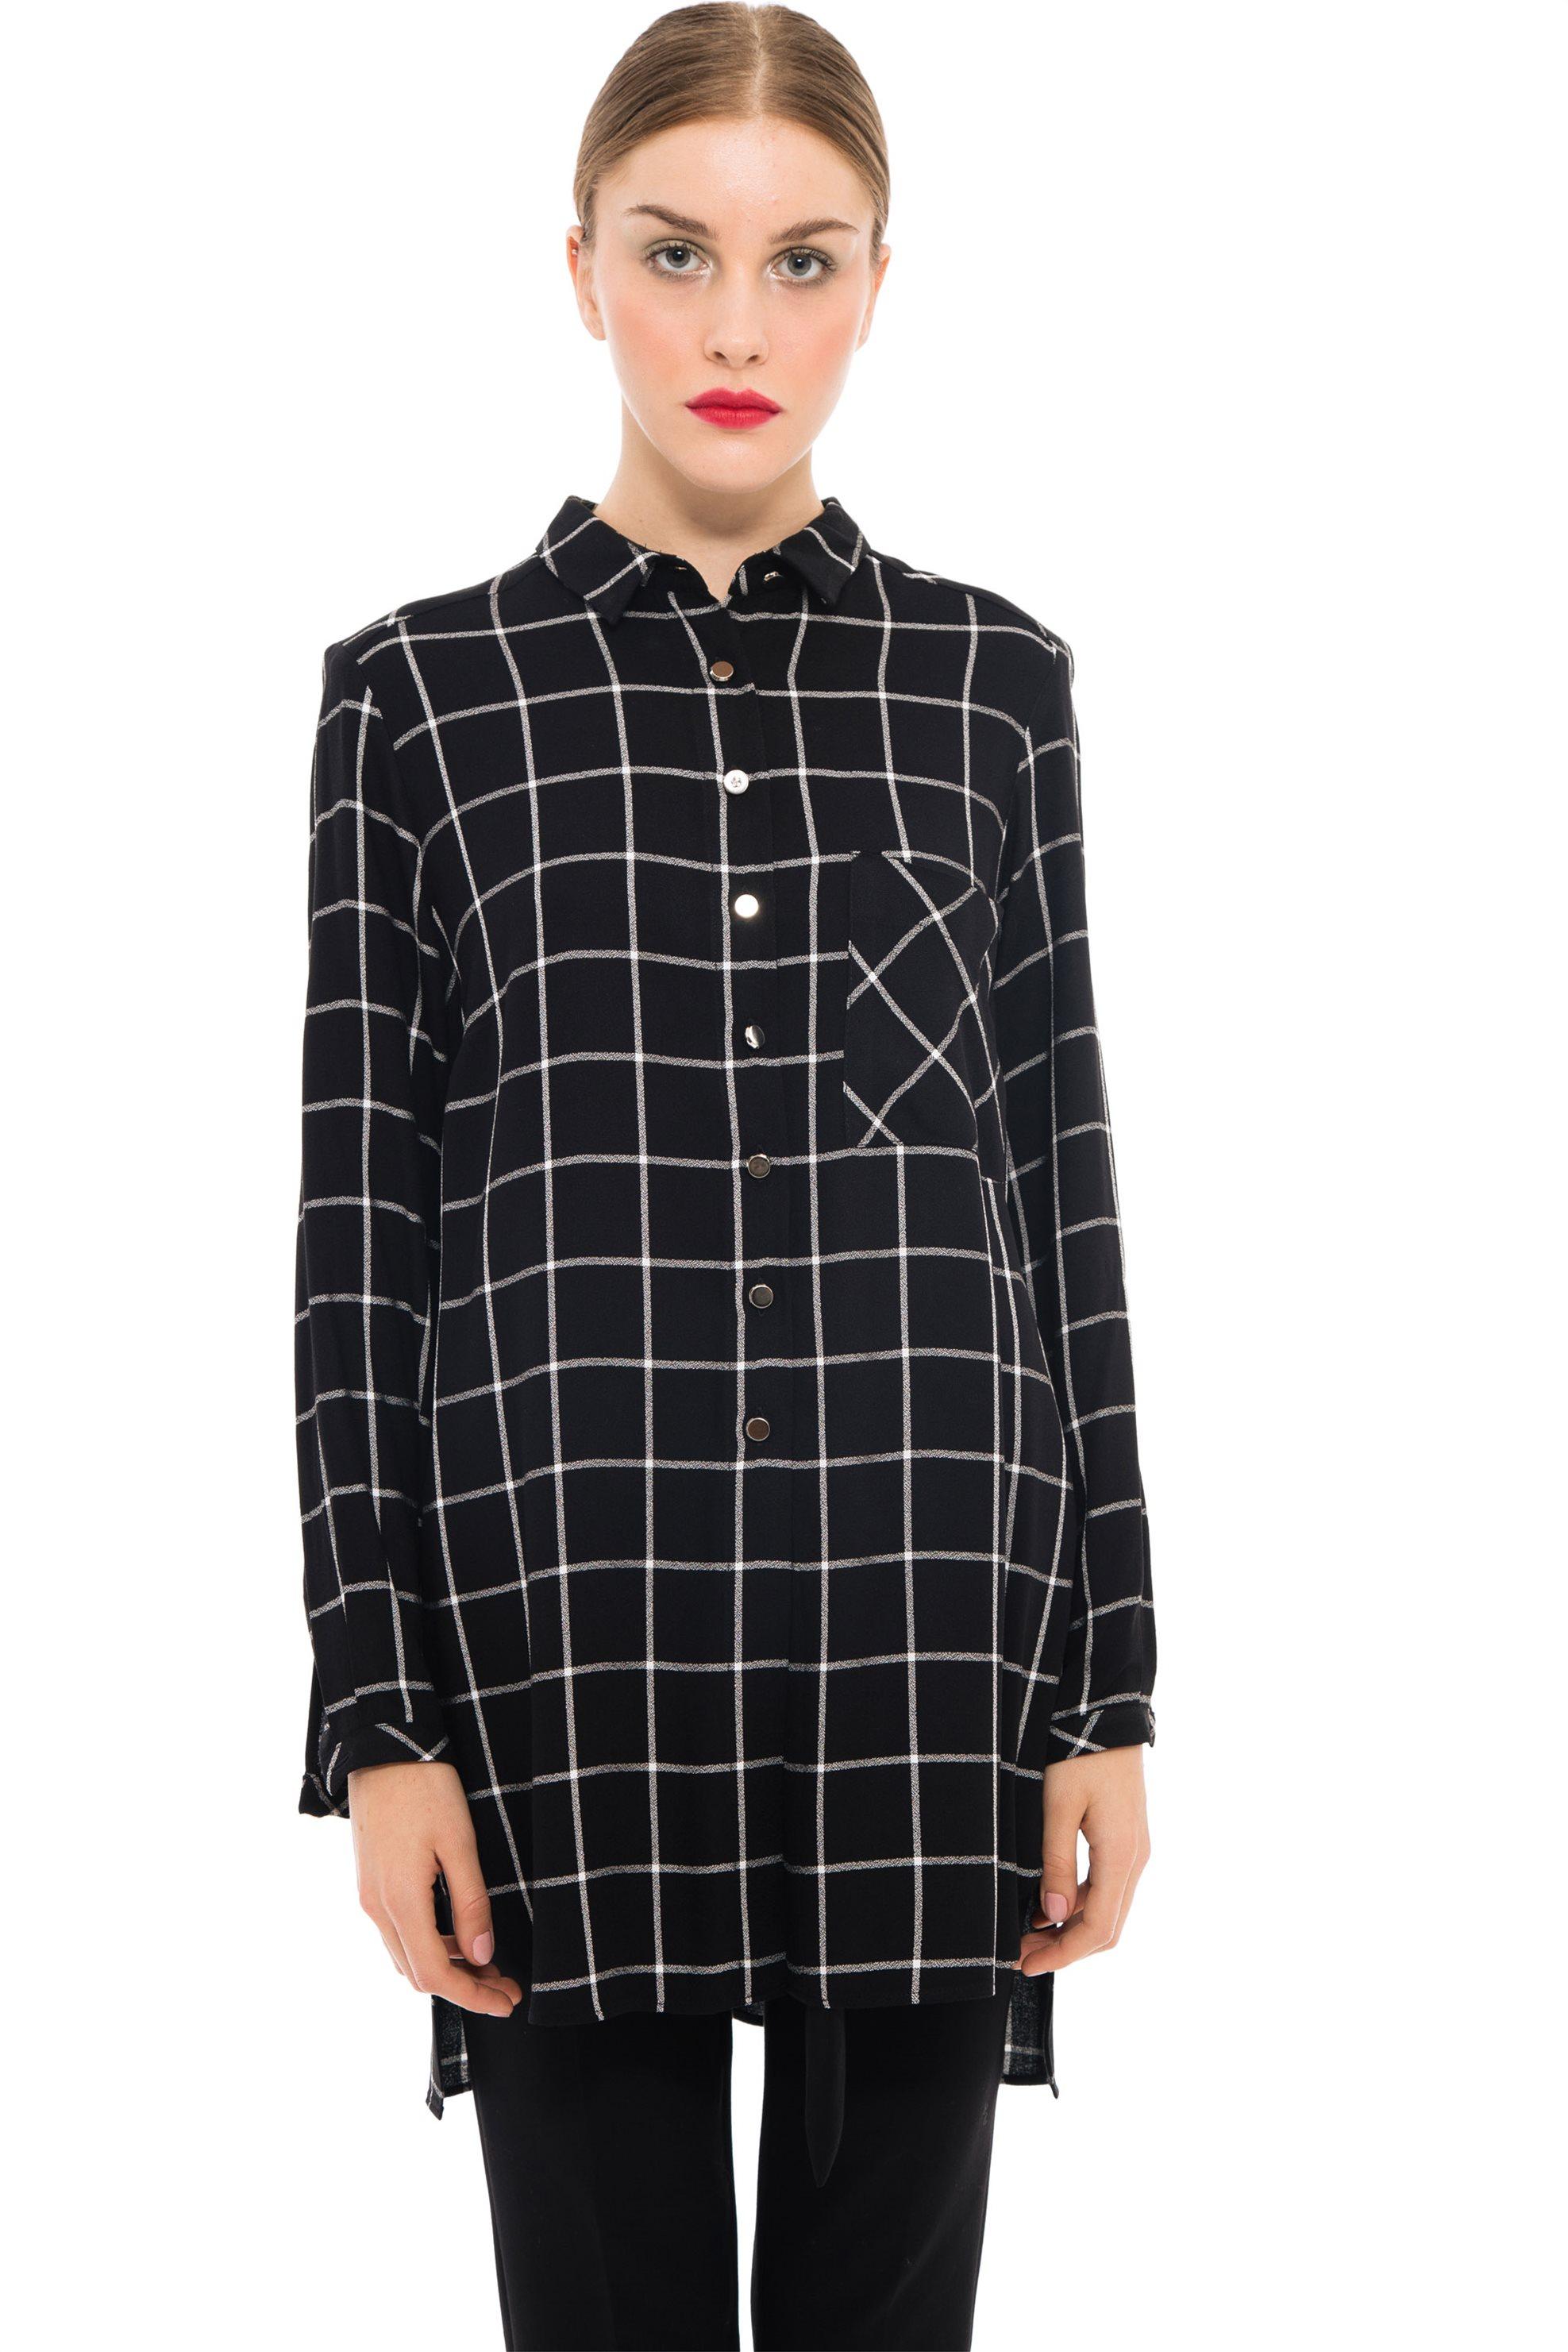 Lucifair γυναικείo μακρύ καρό πουκάμισο - 61419 - Μαύρο γυναικα   ρουχα   tops   πουκάμισα   casual